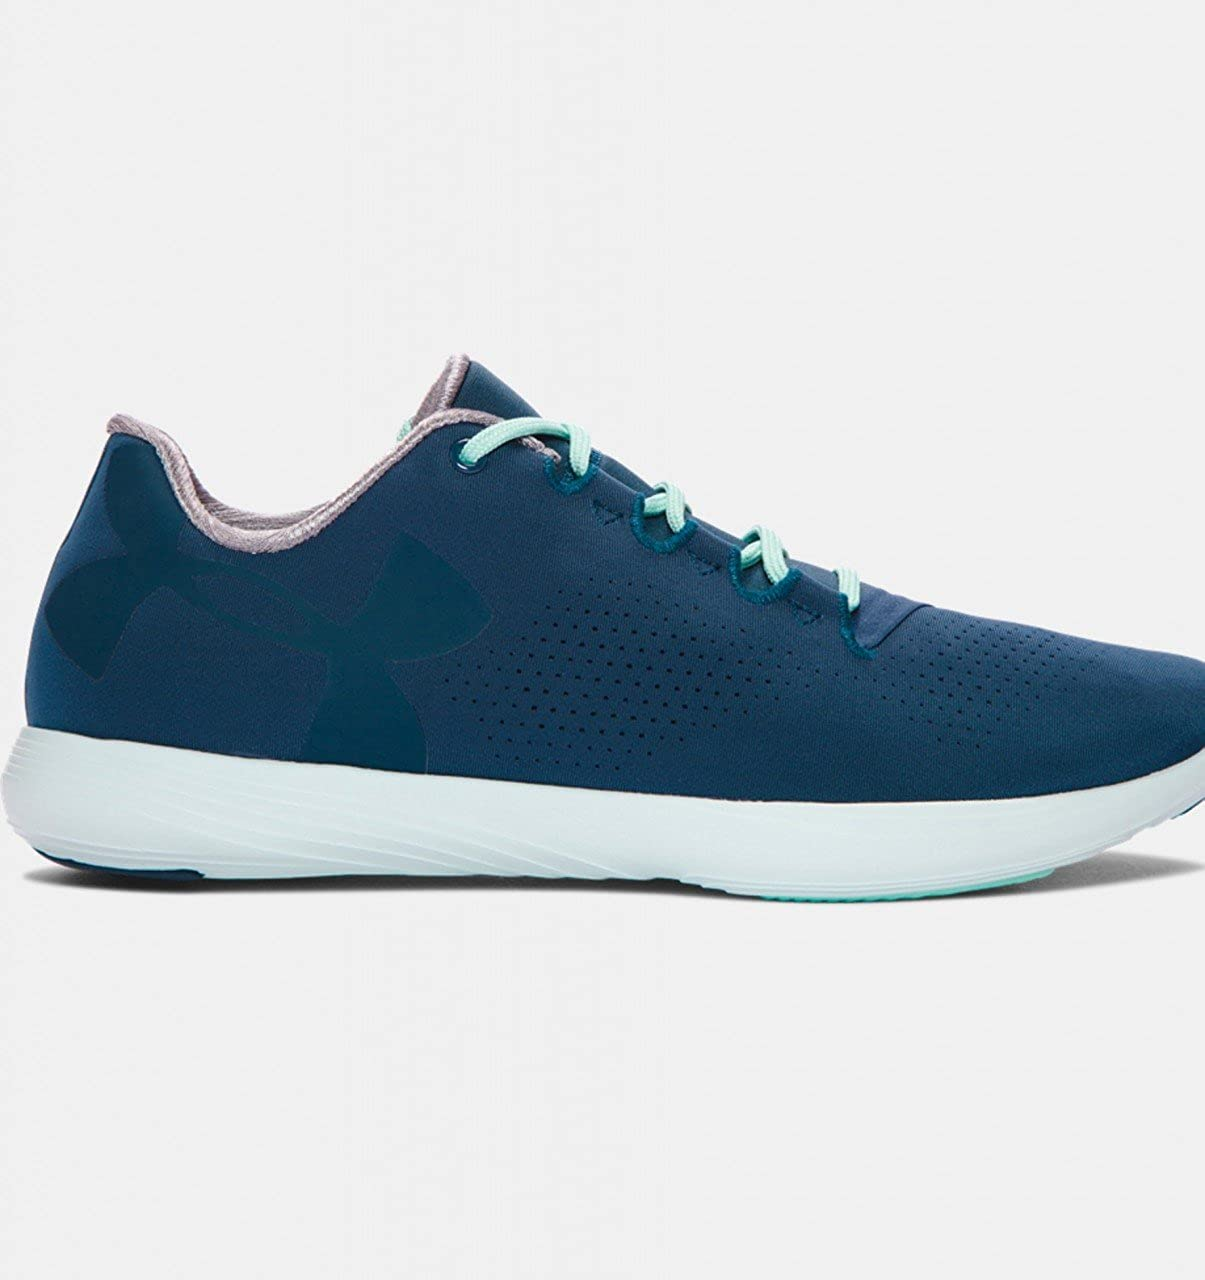 sklep internetowy Kup online spotykać się Under Armour Women's UA Street Precision Low Nova Teal/Crystal/Nova Teal  Athletic Shoe